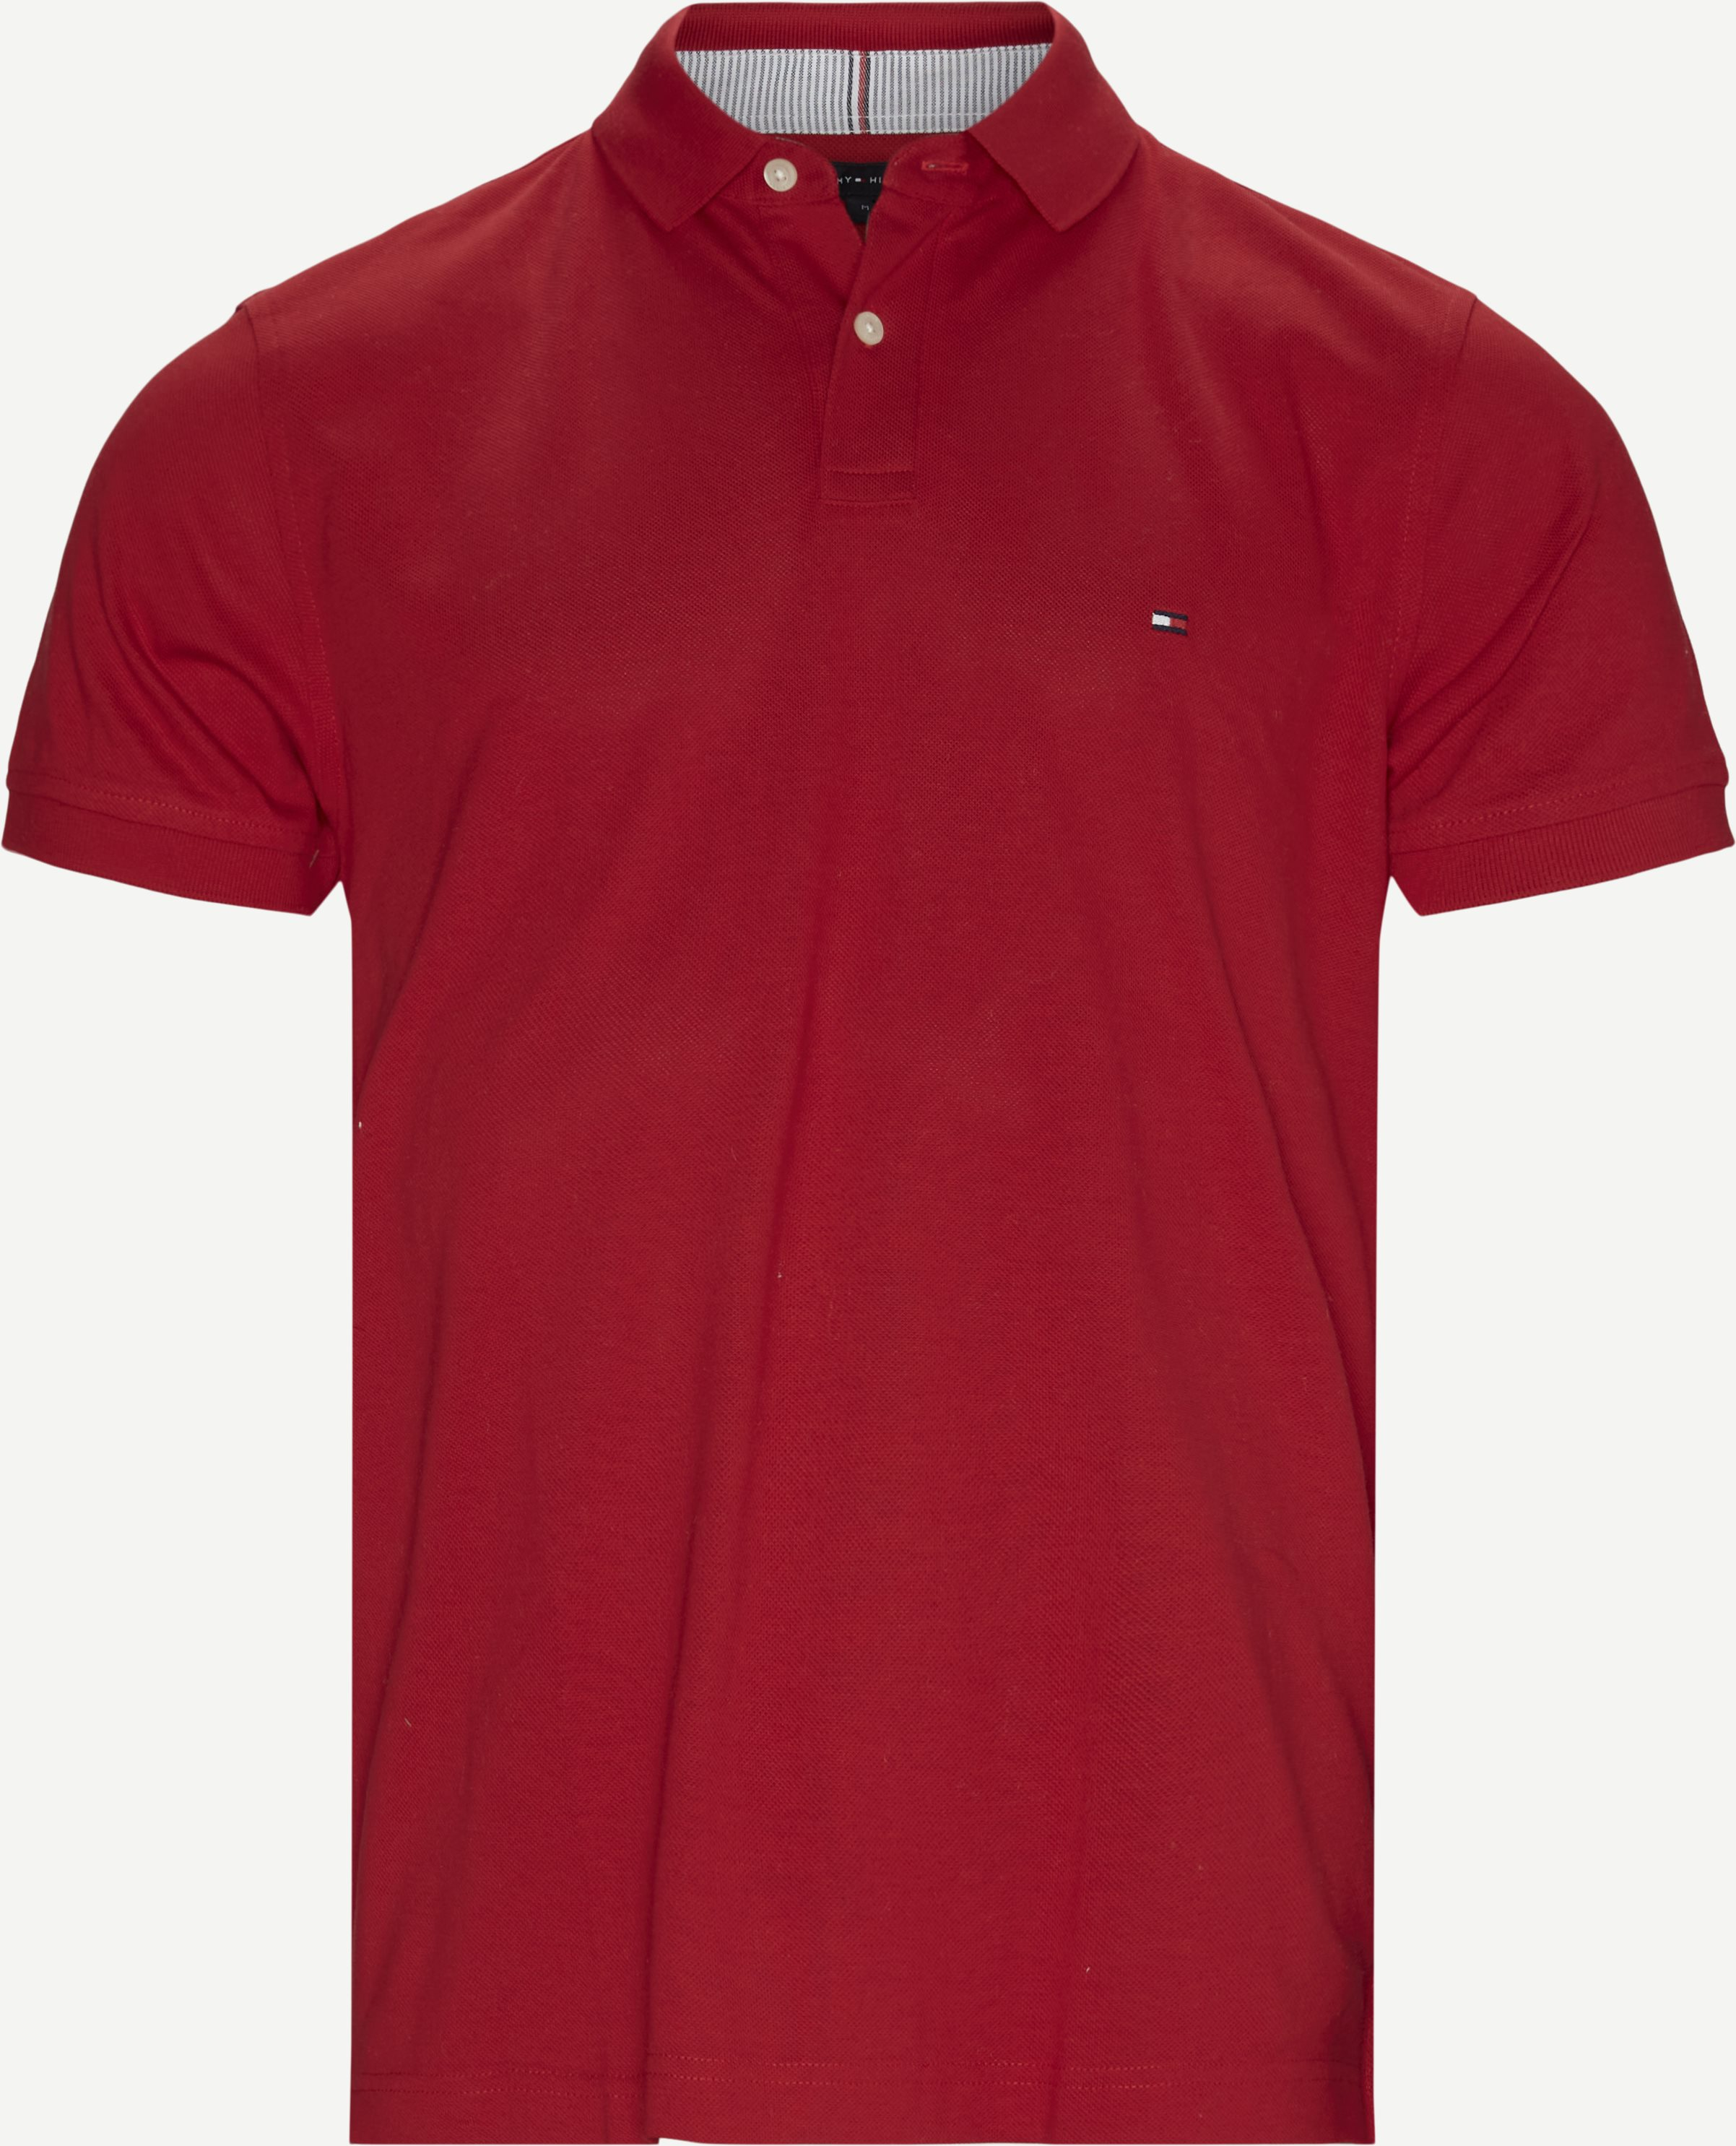 T-Shirts - Regular fit - Rot